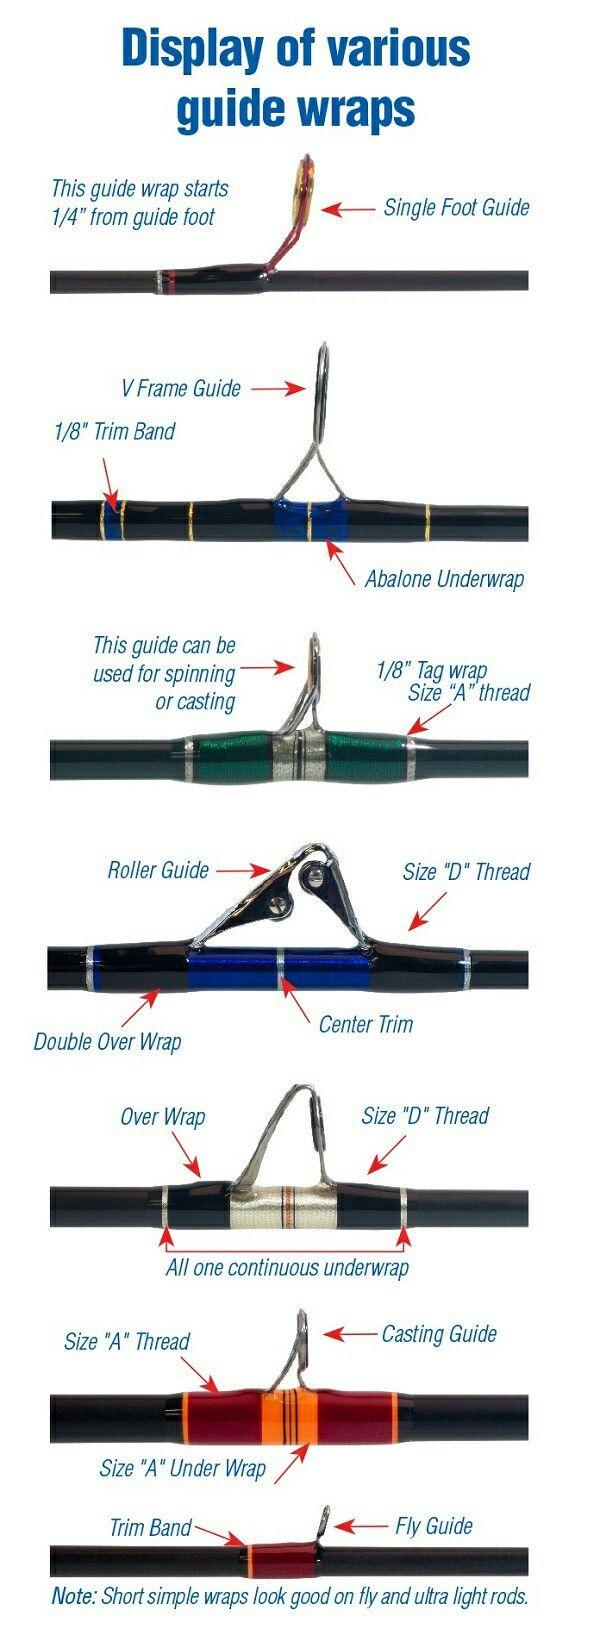 Fishinghttps://www.westmarine.com/buy/mercury-marine--flo-torq-ii-hub-kits-and-components--P006_190_002_541?recordNum=10